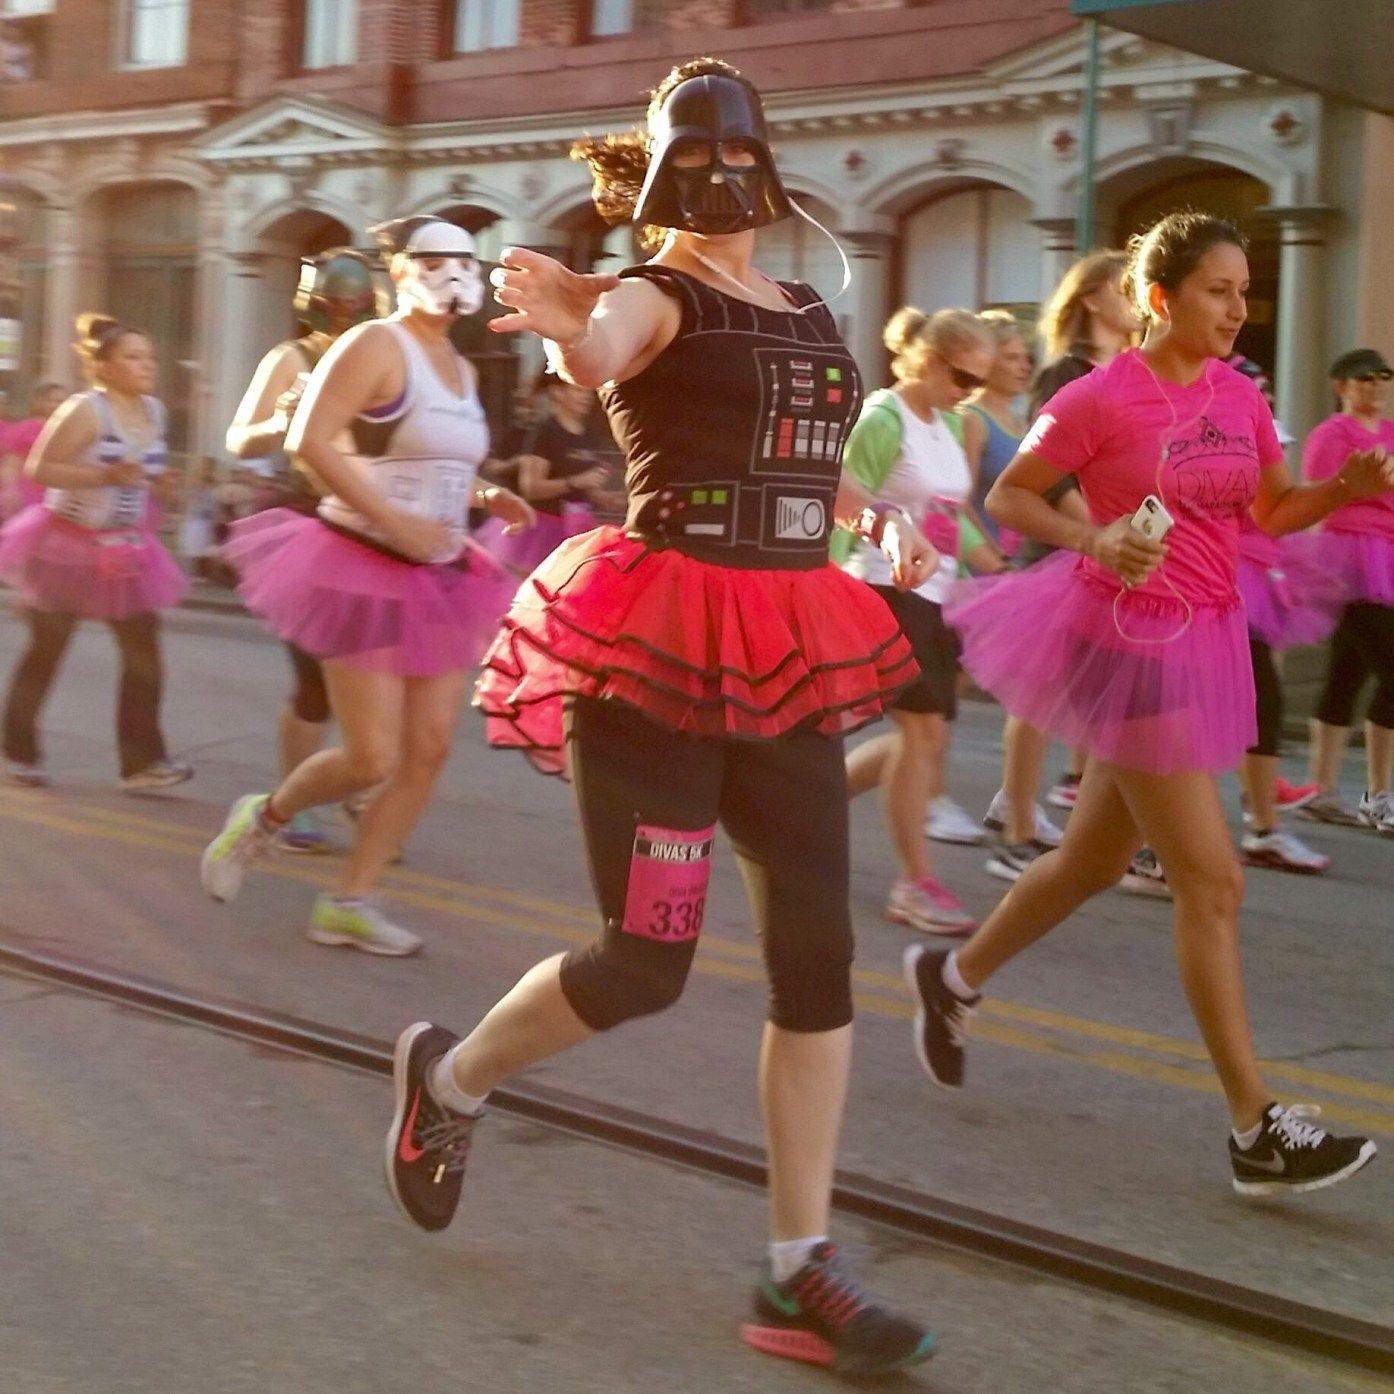 Thoughts While Running A Half Marathon Half Marathon Goofy Costume Run Like A Girl